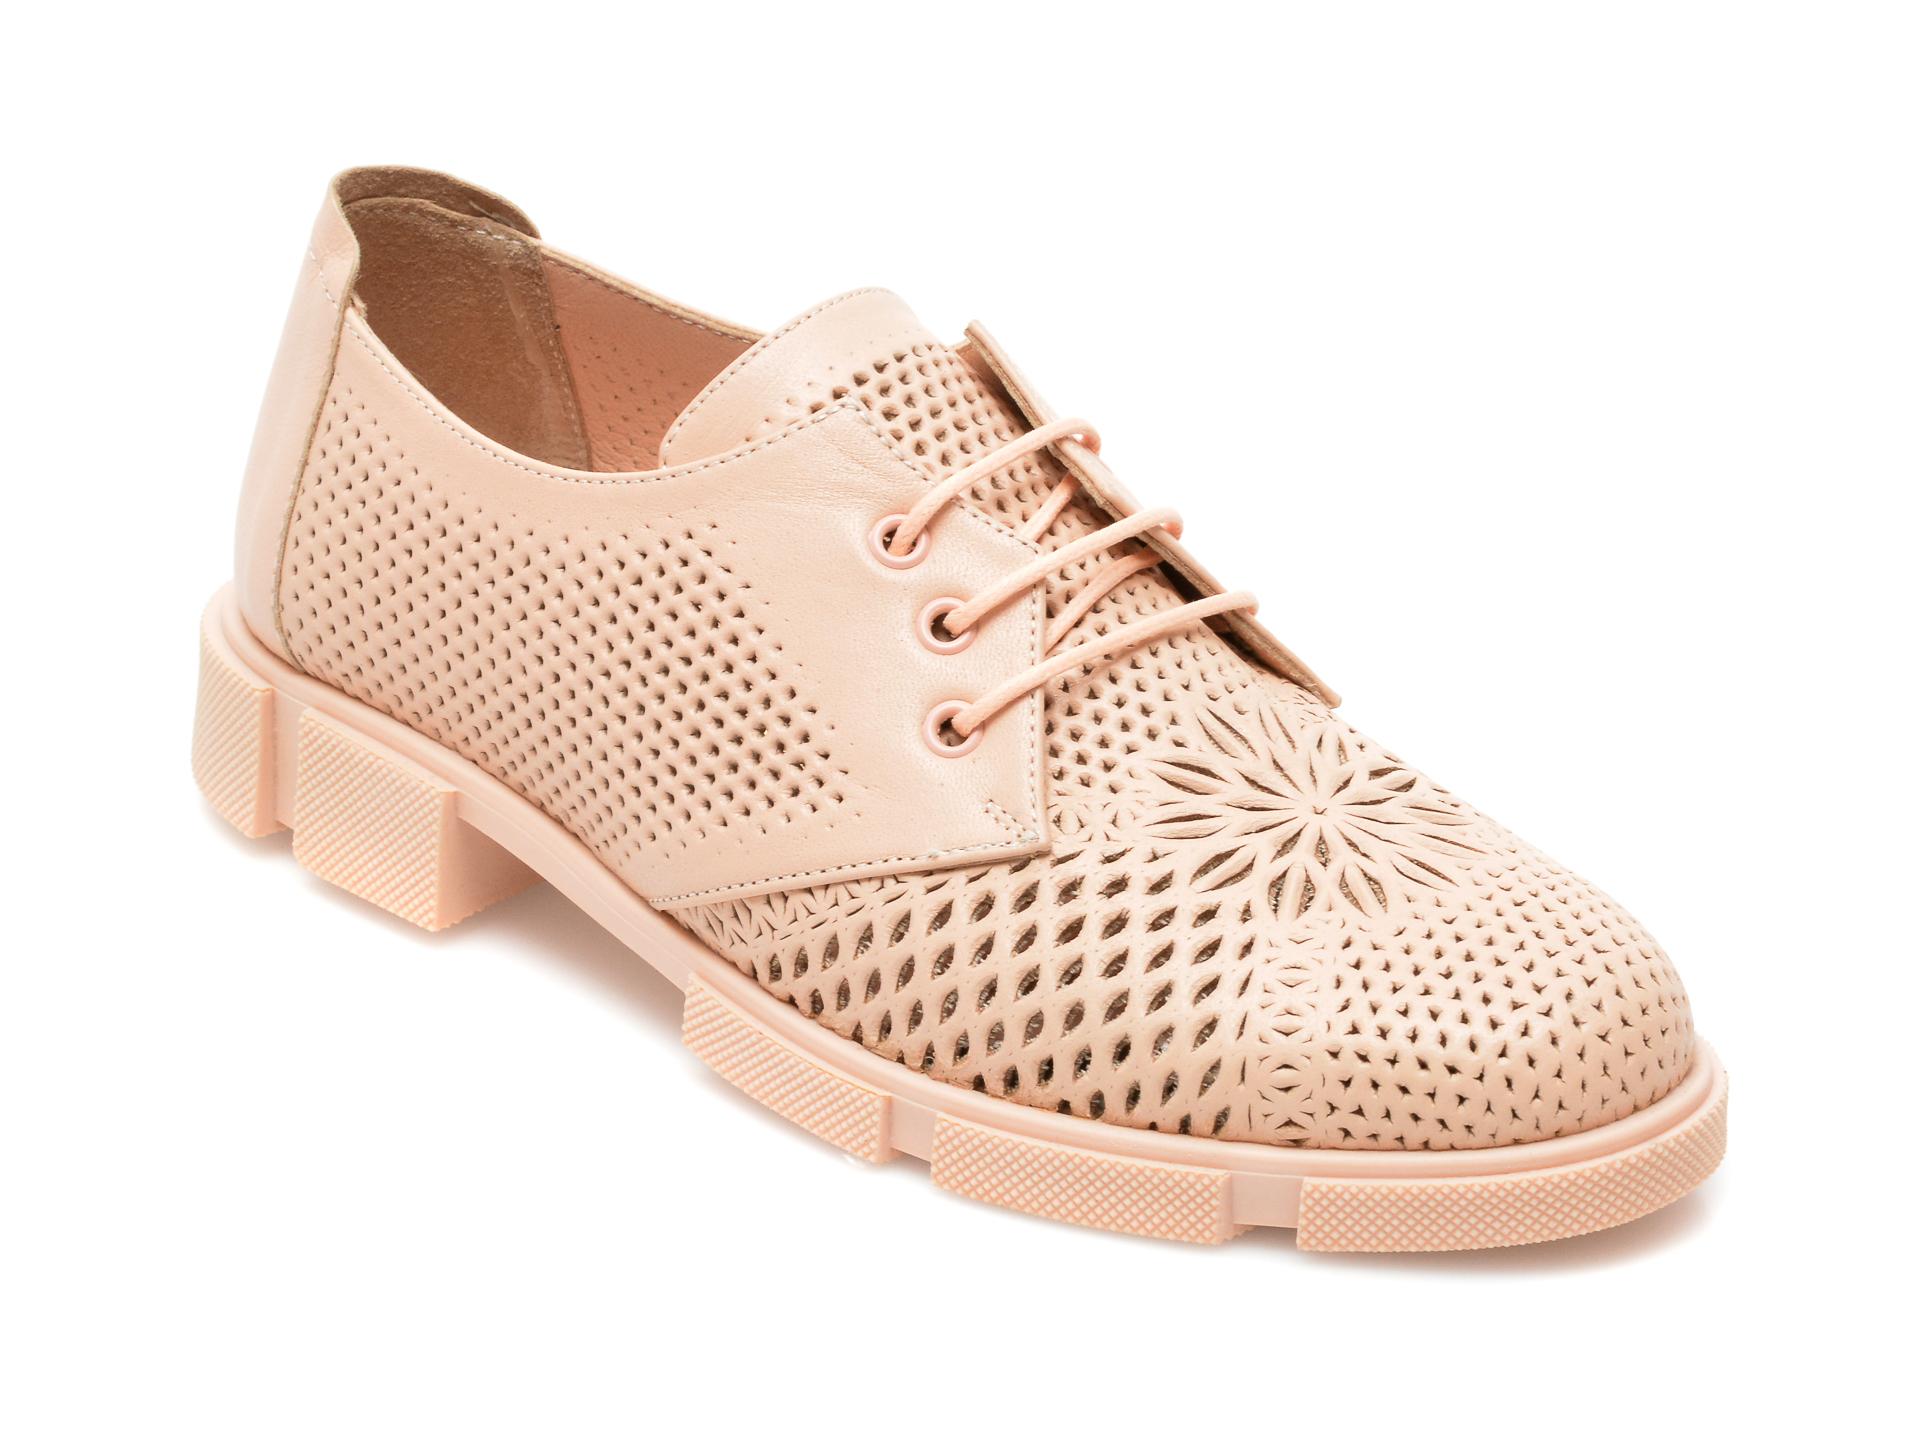 Pantofi MOLLY BESSA nude, MN106, din piele naturala